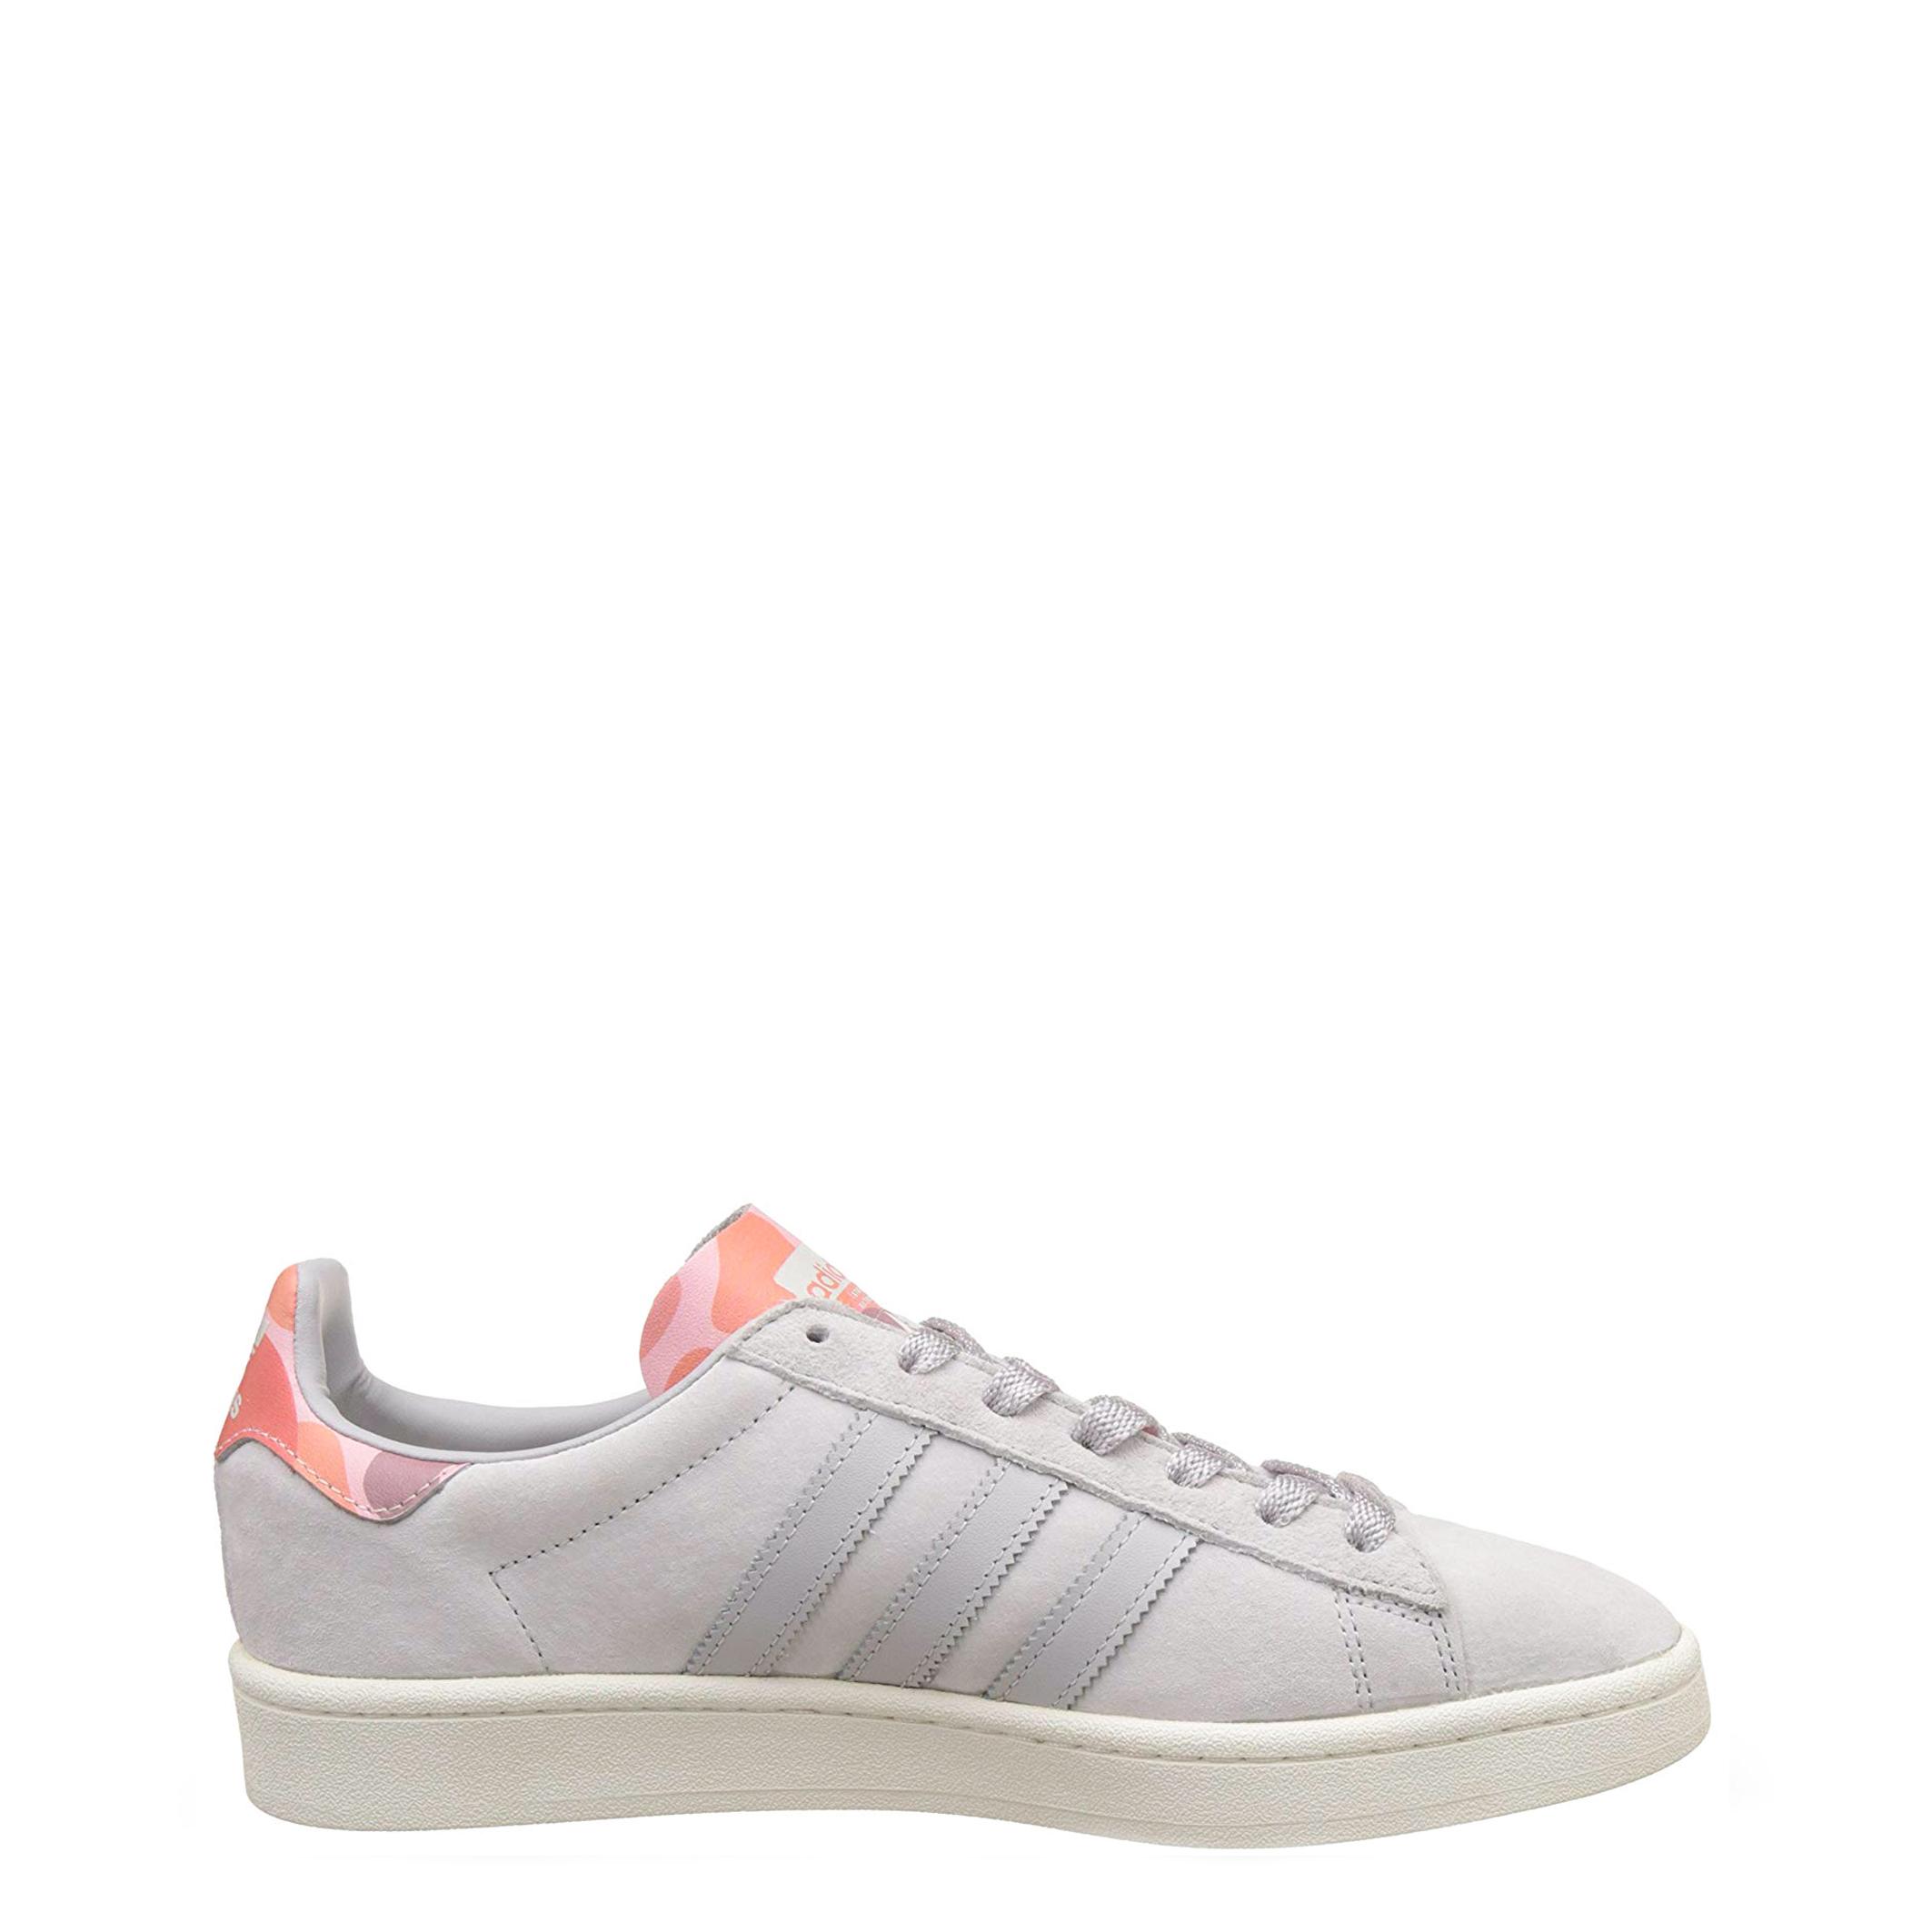 Adidas ADULTS CAMPUS